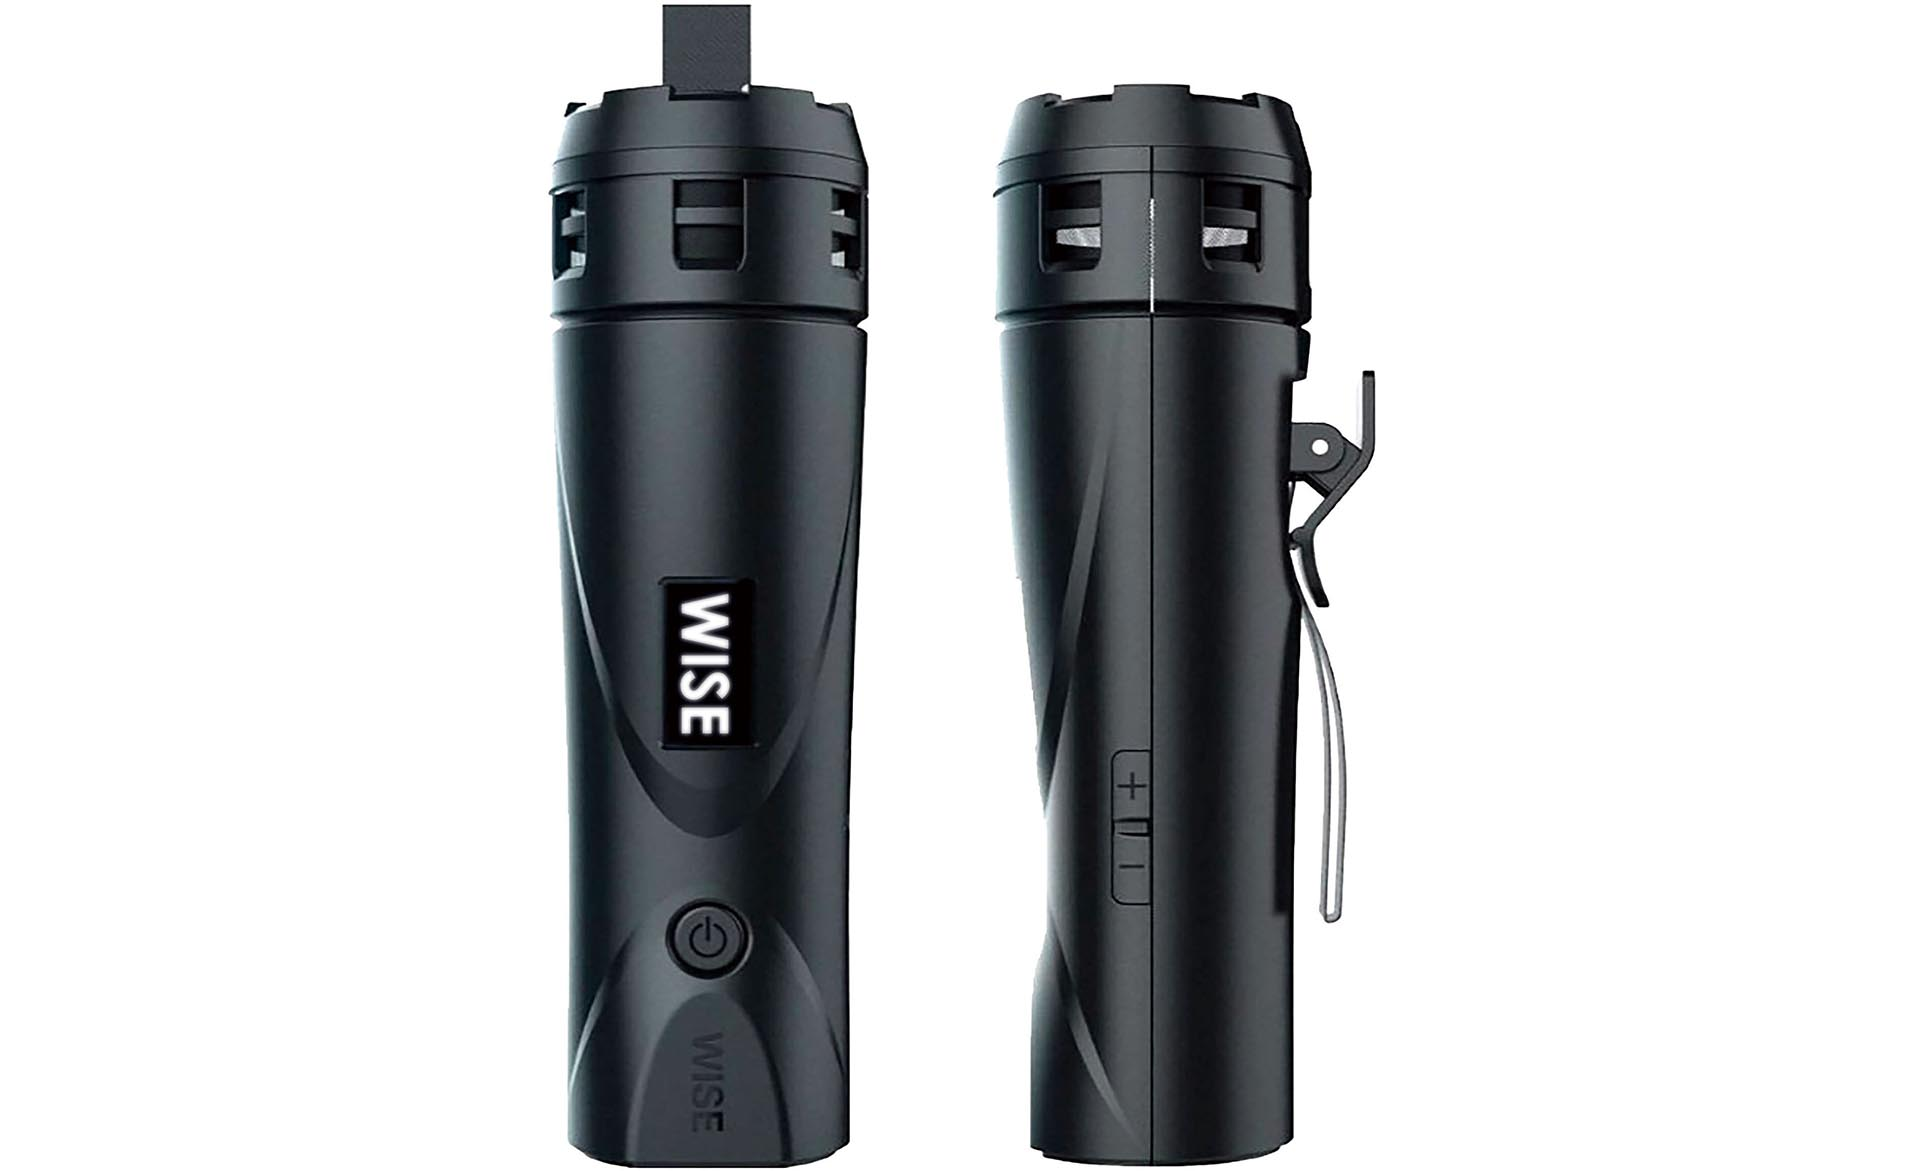 MB1000-2